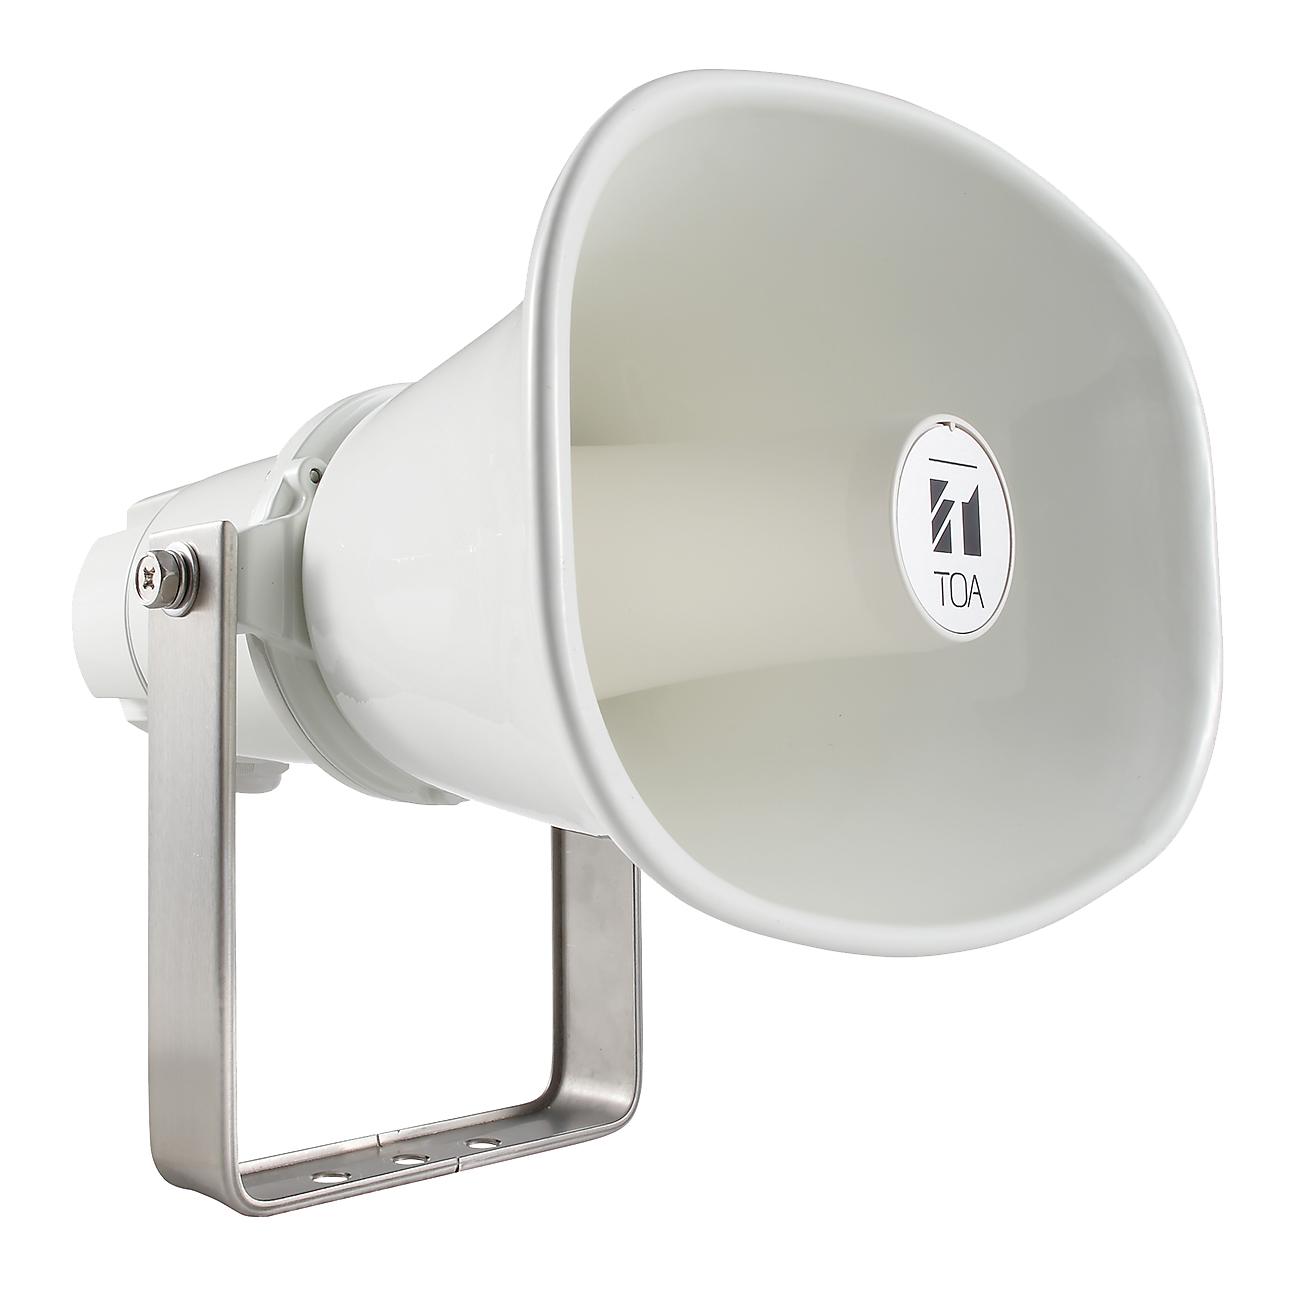 IP Horn Speaker side view